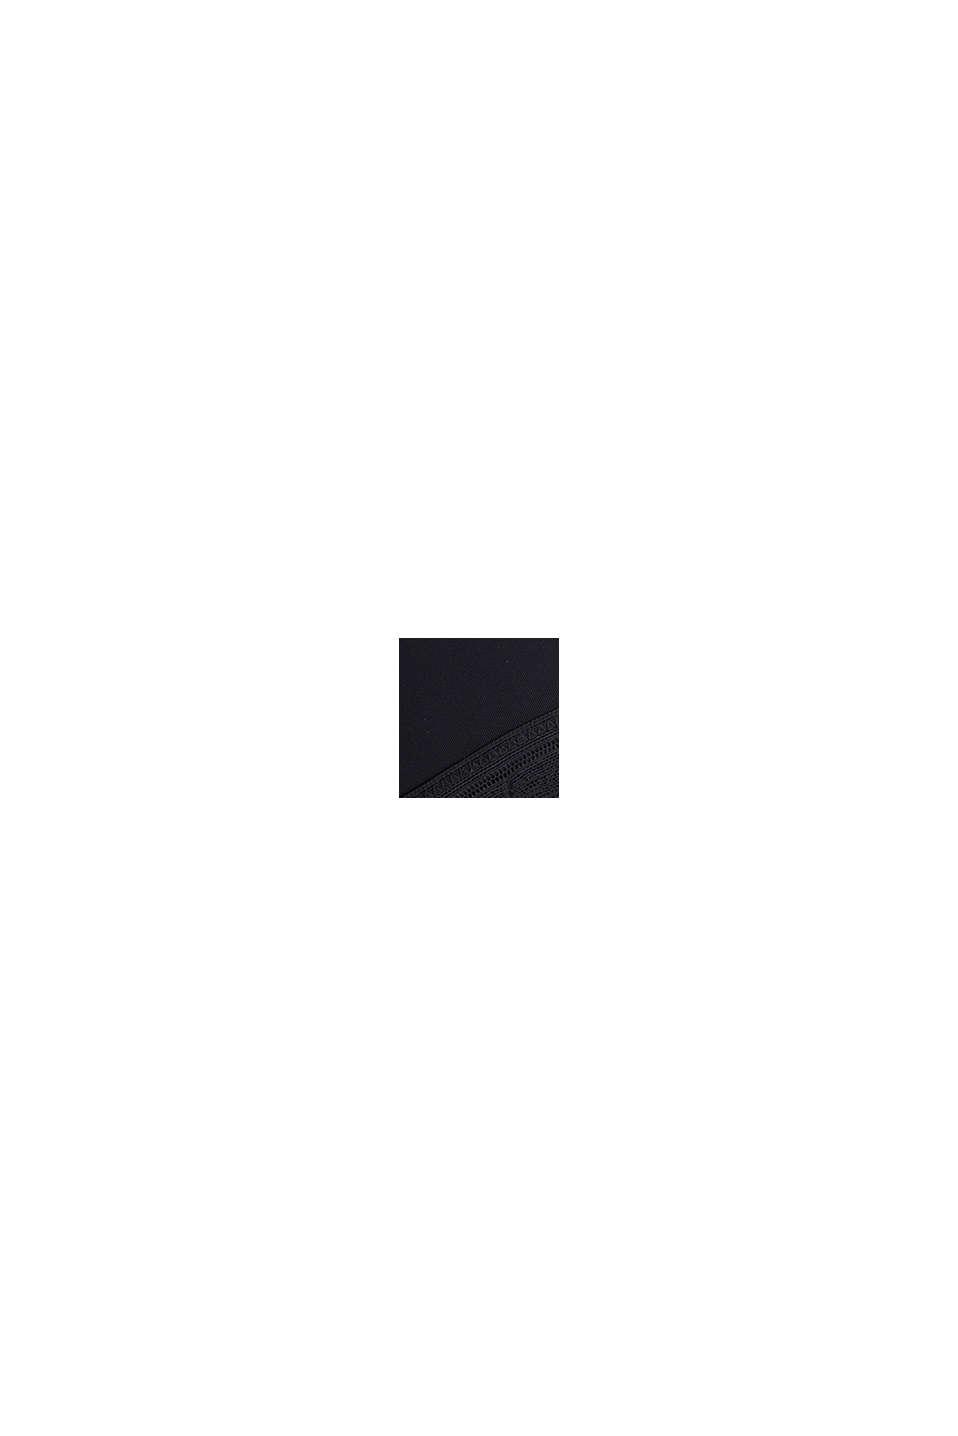 Push-up-bh met gezigzagde kant, BLACK, swatch